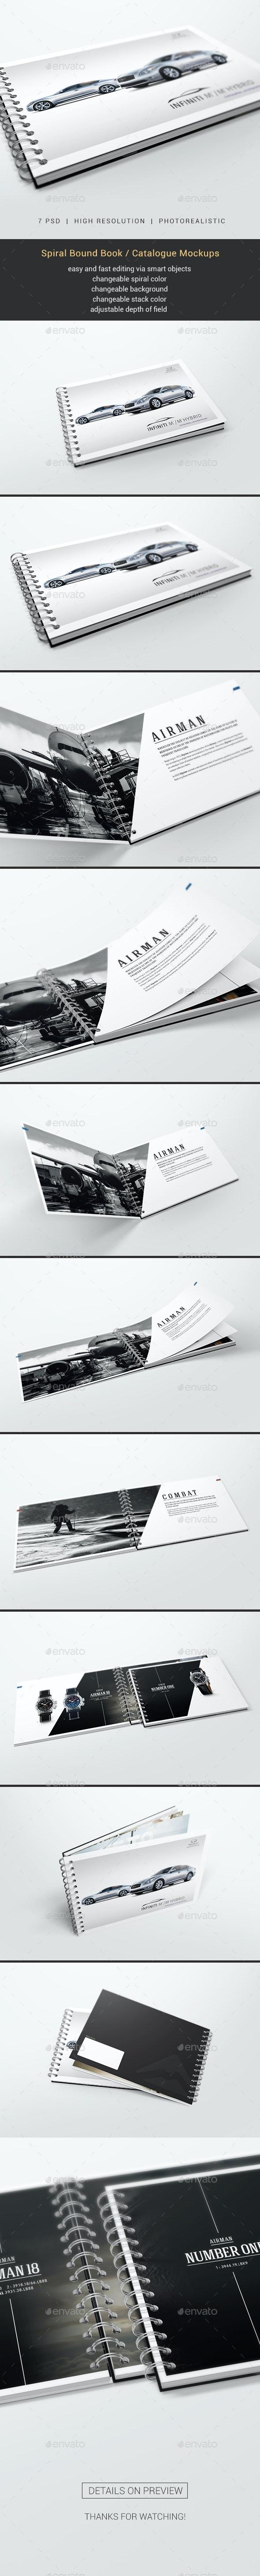 Spiral Bound Book / Catalogue Mockups - Books Print